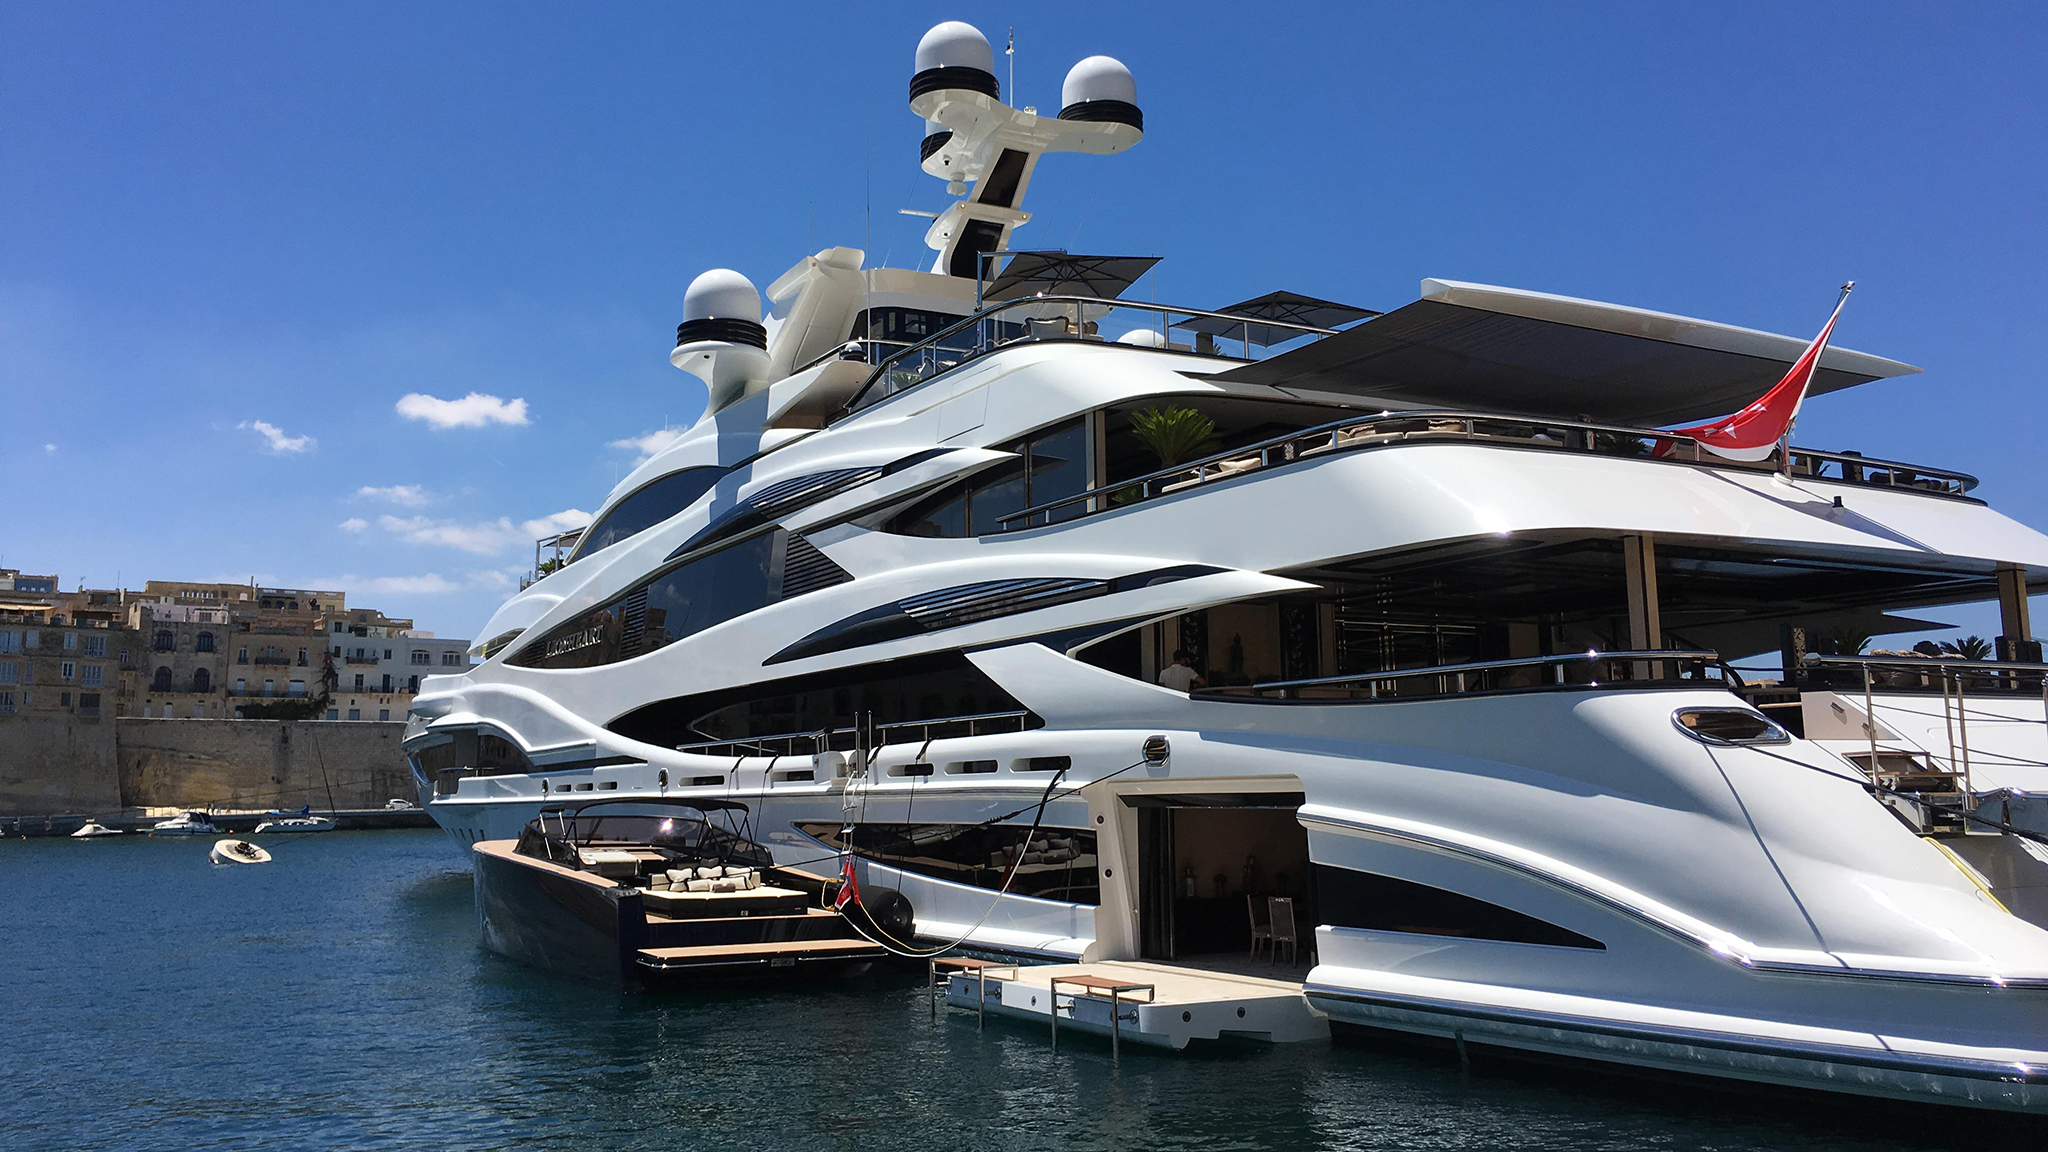 Hidden 3d Illusion Wallpapers Superyachts Magnify Billionaires Worst Traits